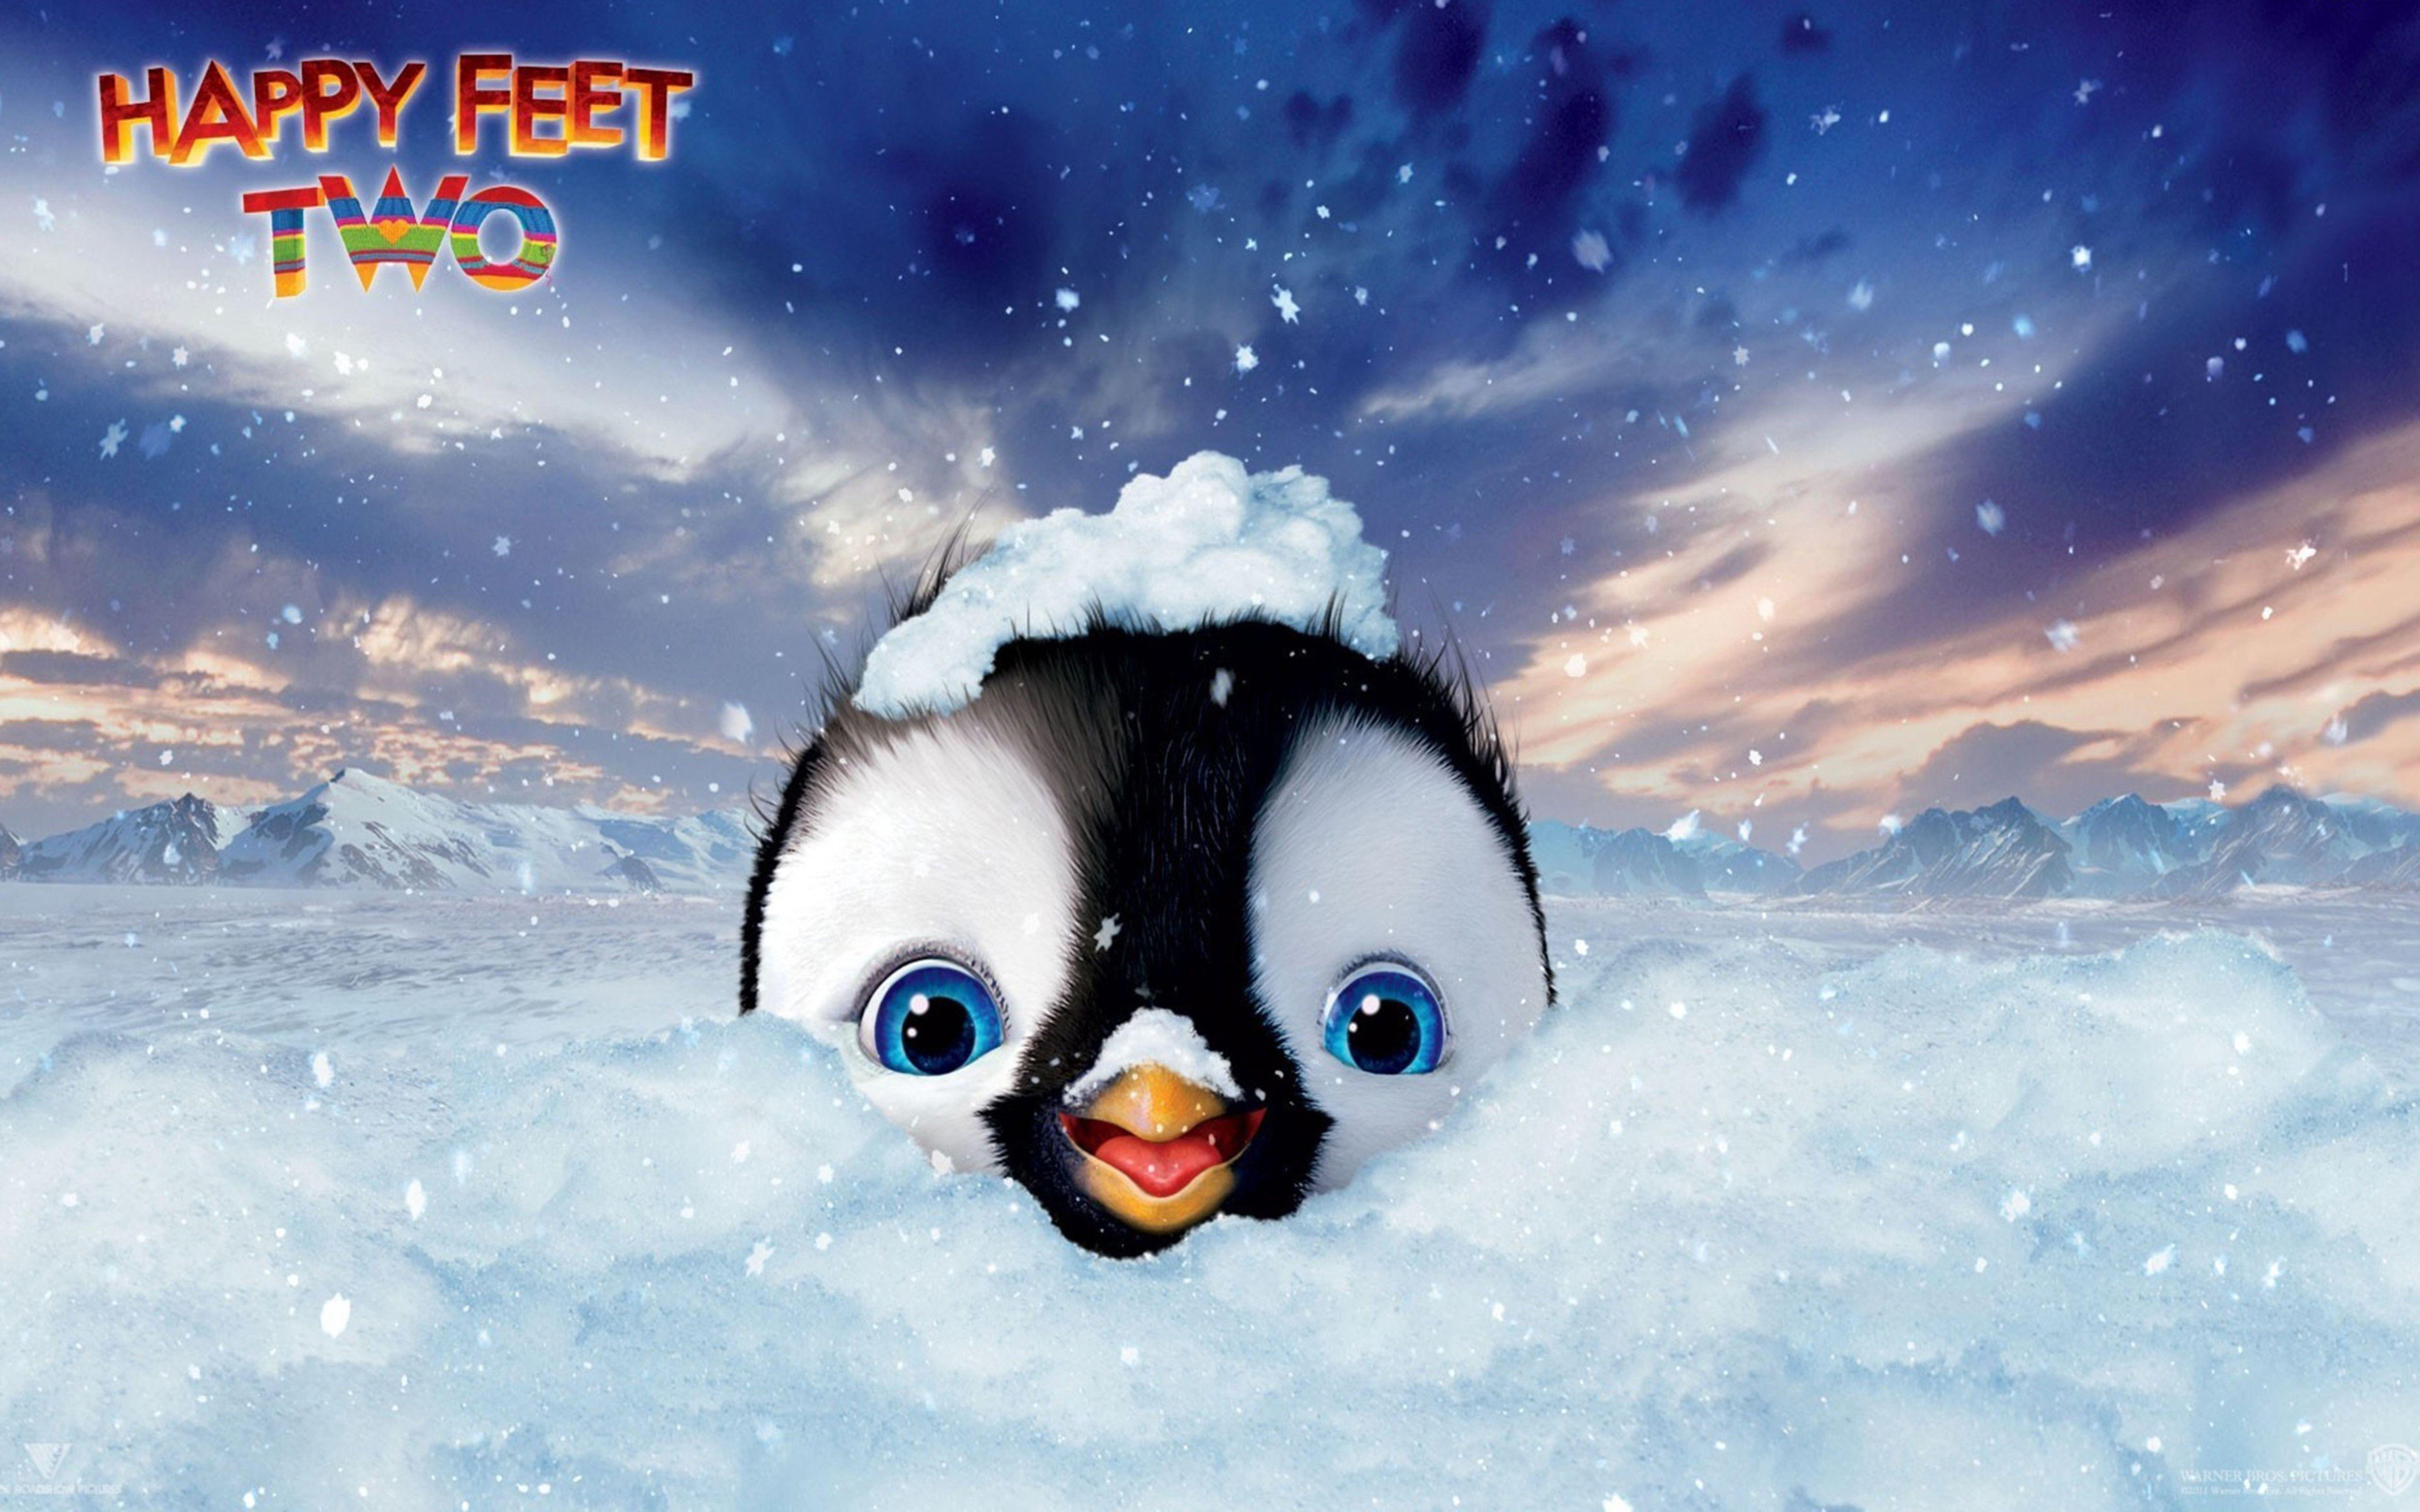 Wallpaper Download 5120x3200 Sweet Little Penguin Happy Feet Two Movie Wallpapers Hd Wallpaper Download For Ipad And Iphone Wid Peliculas Latinas Animacion